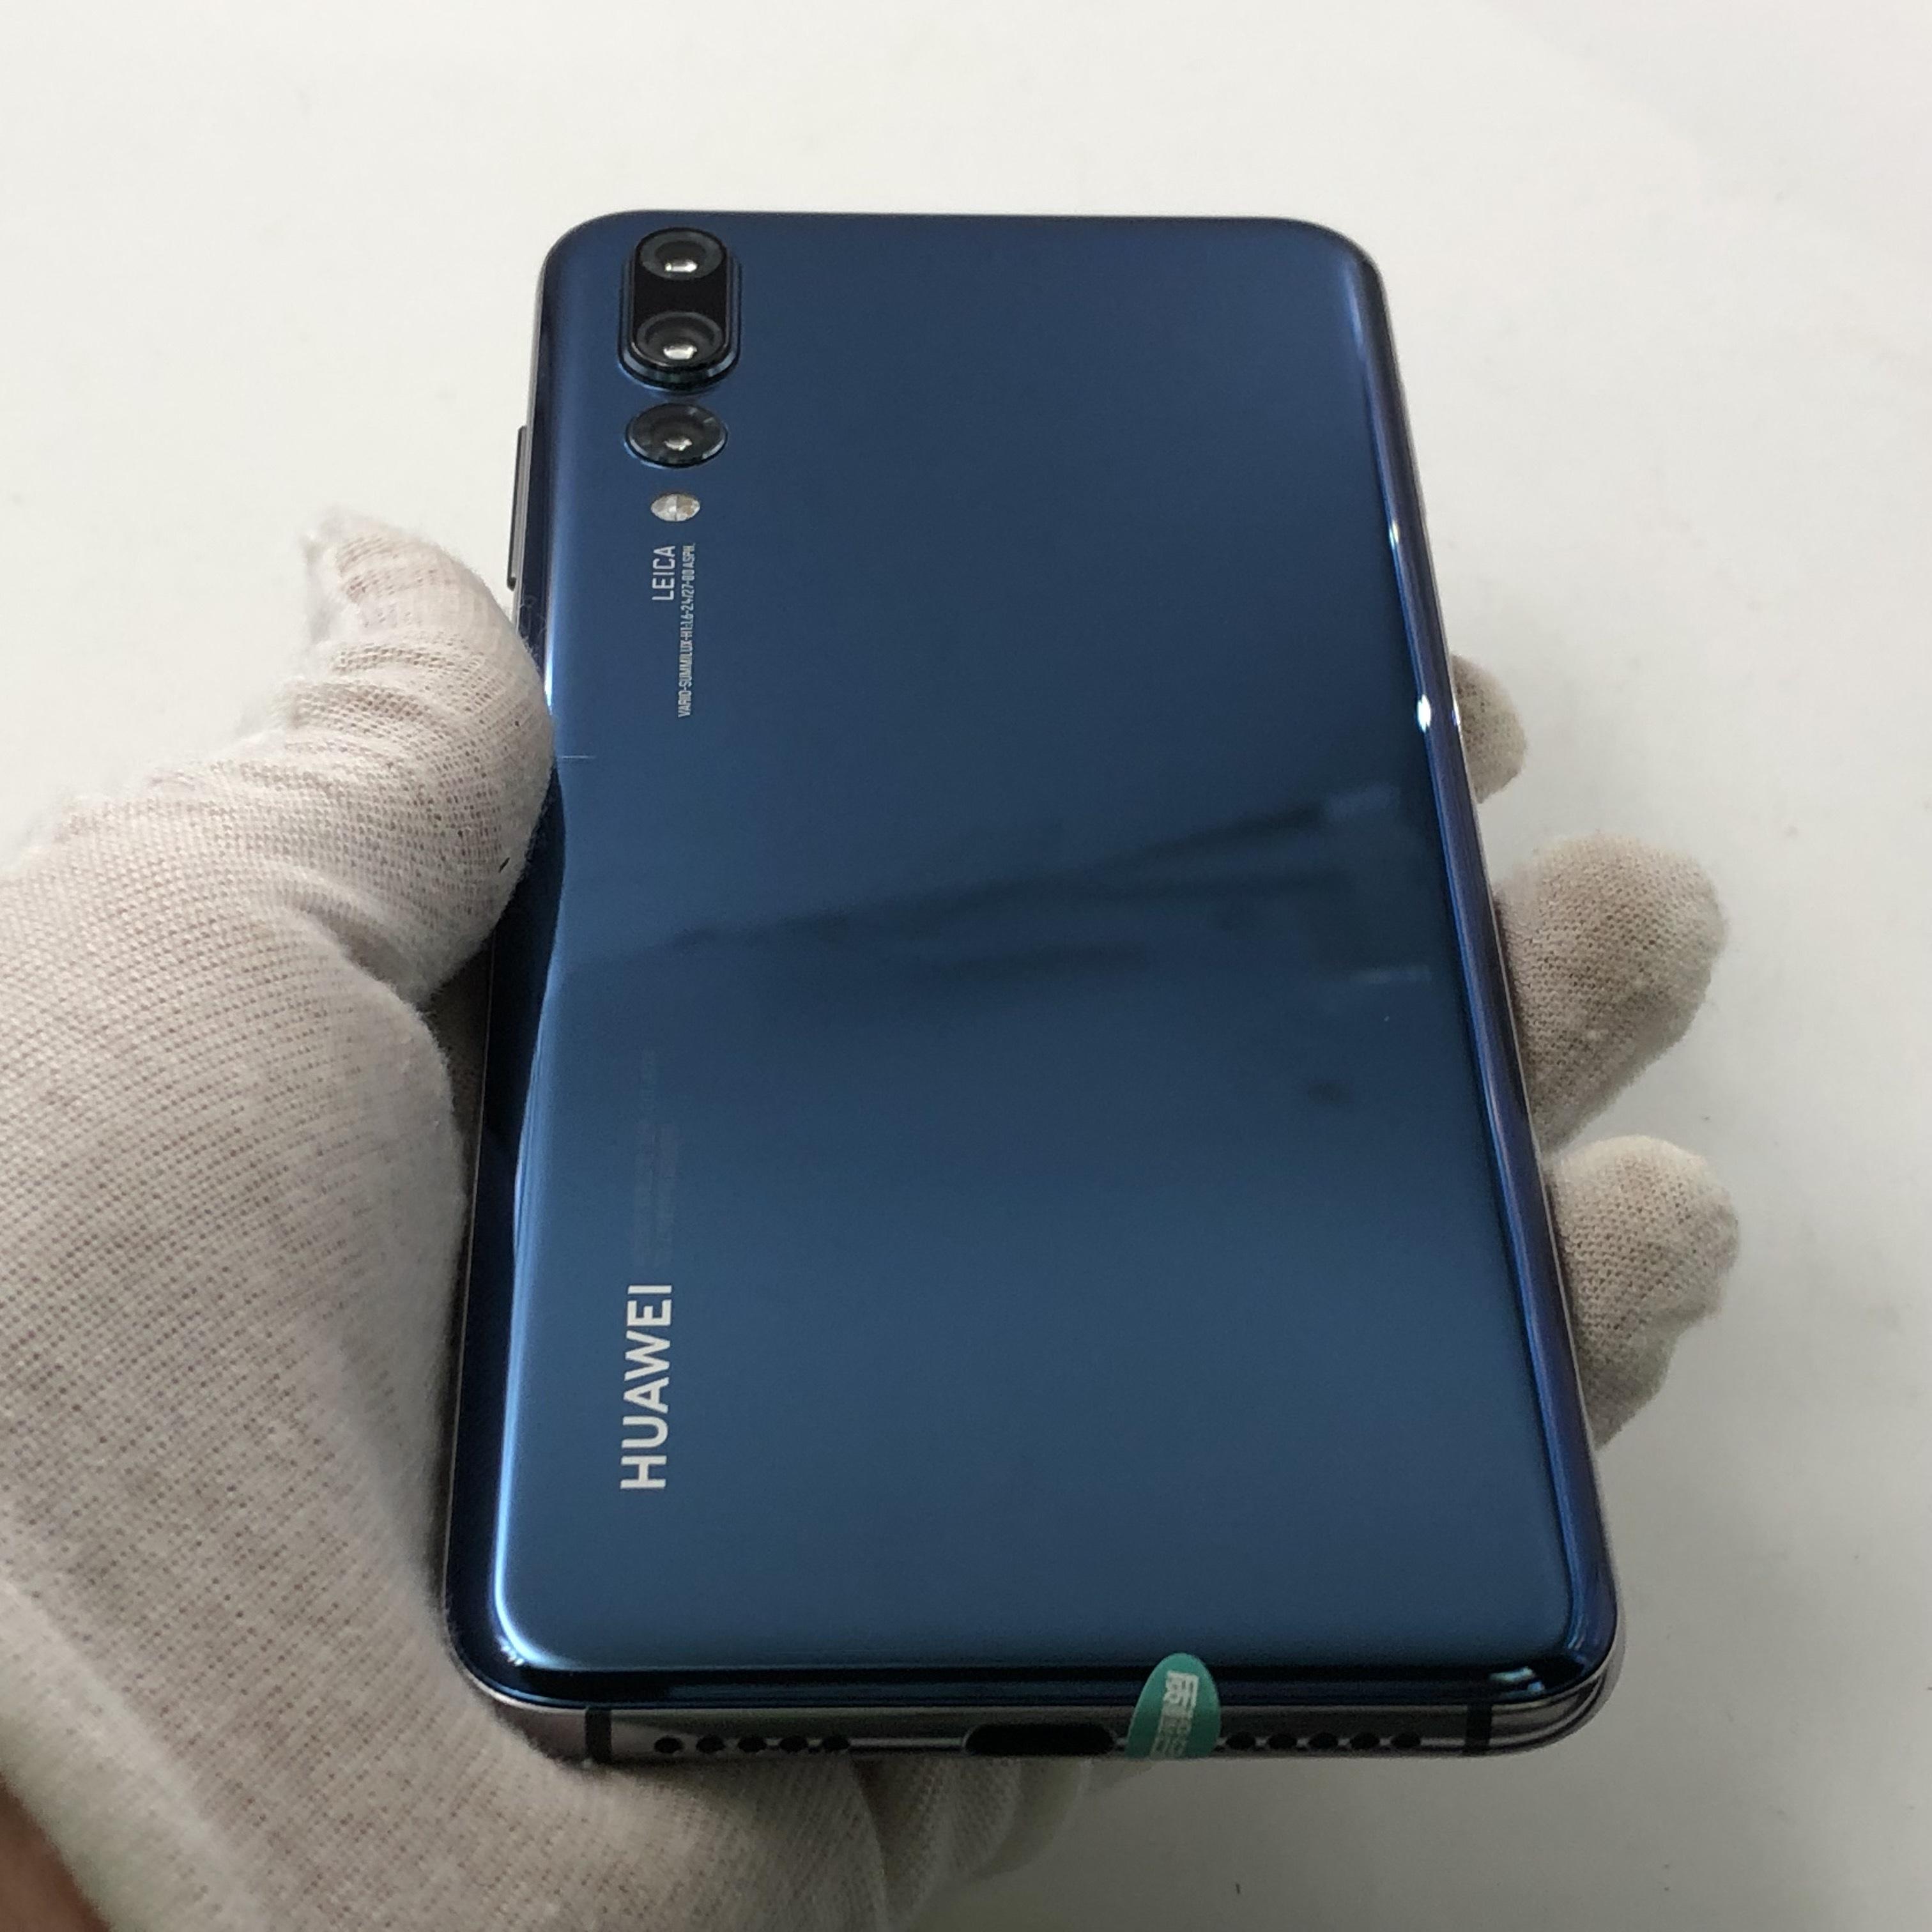 华为【P20 Pro】4G全网通 蓝色 6G/256G 国行 99新